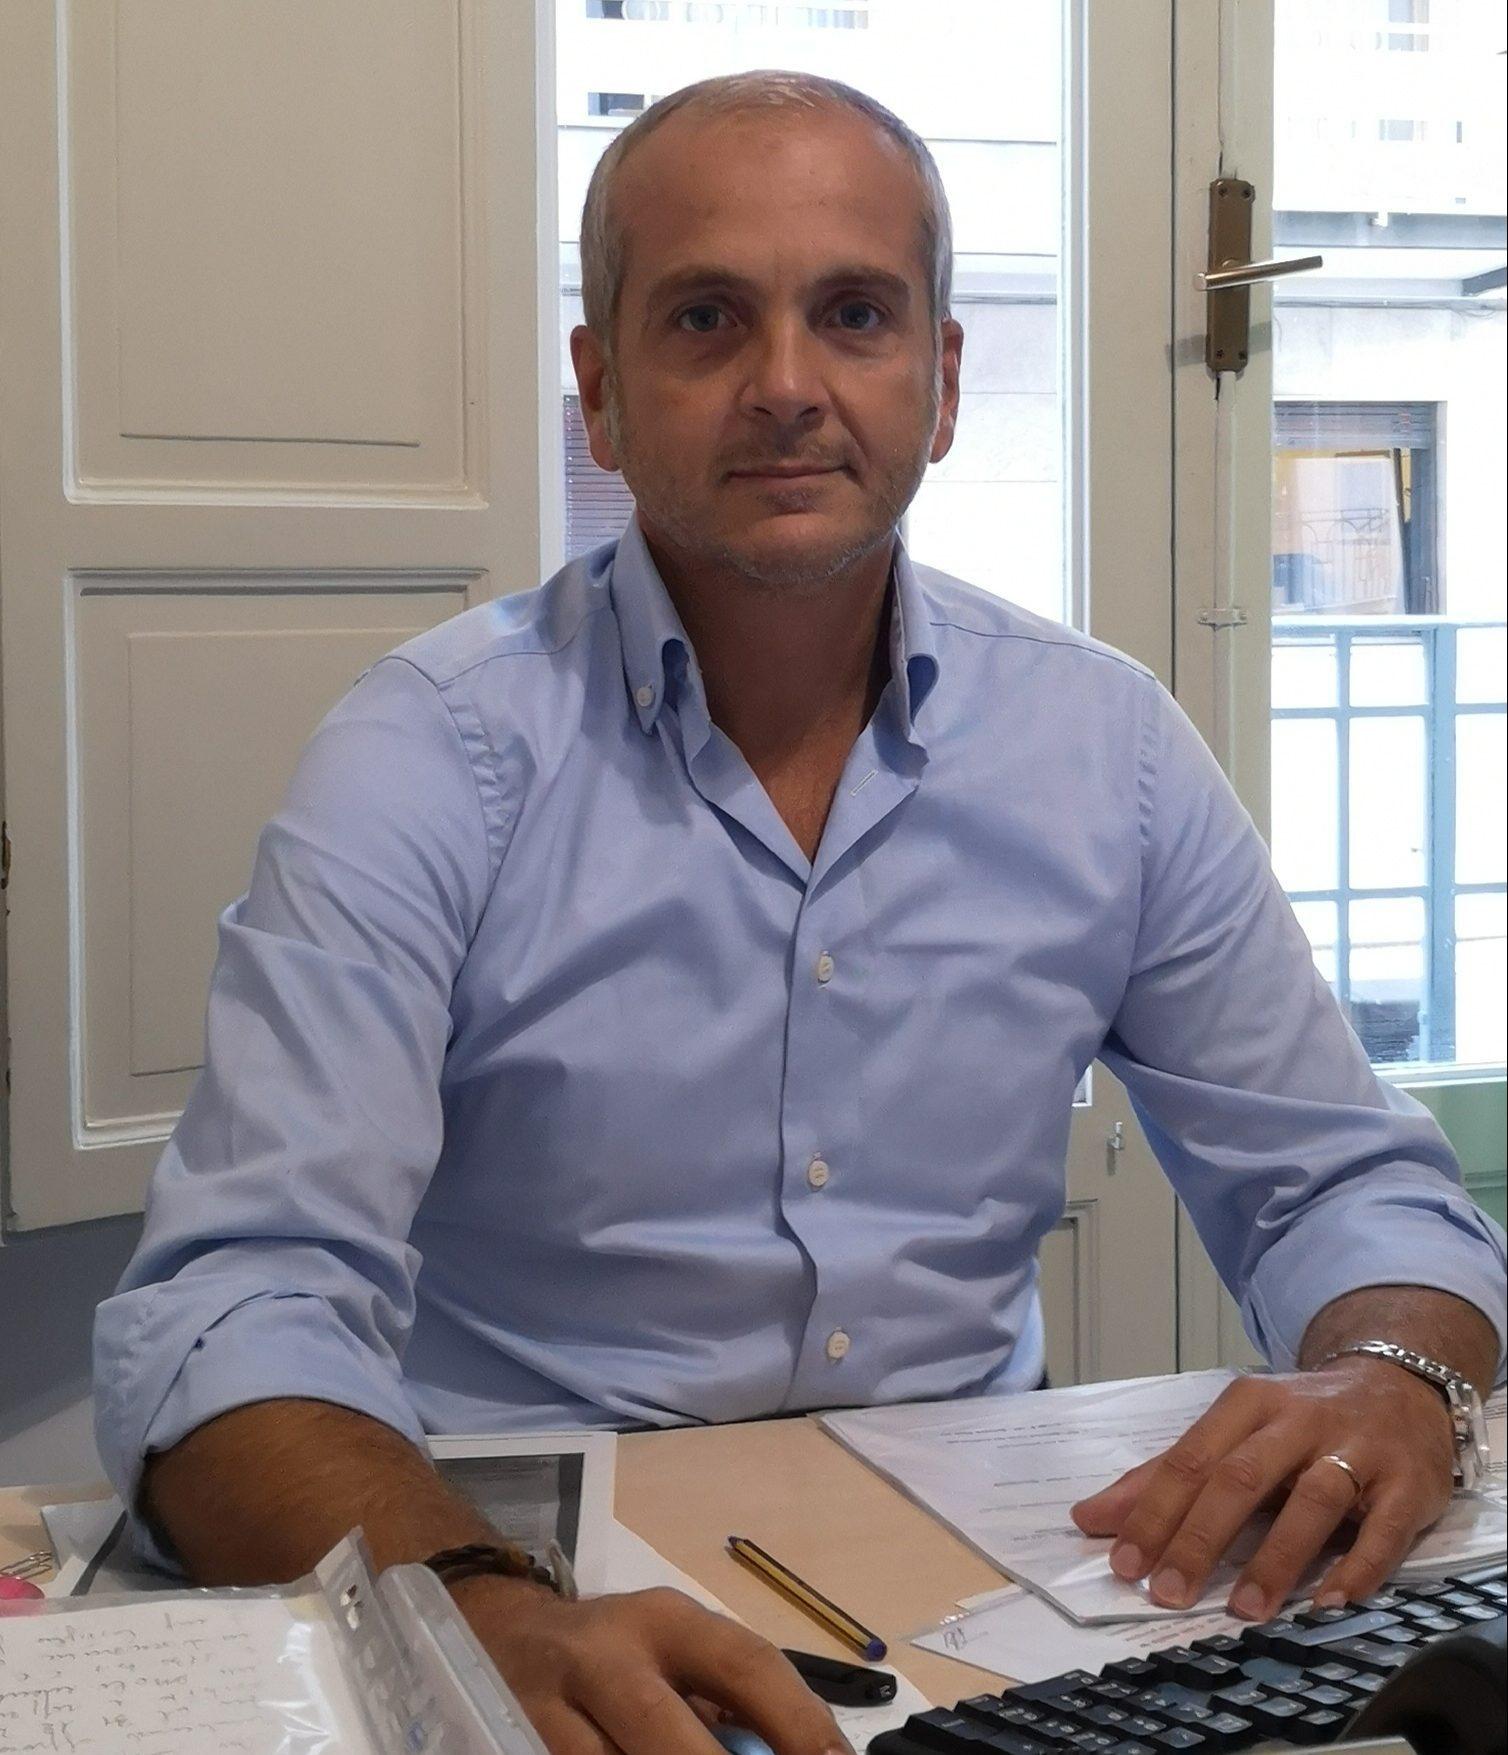 Giovanni Capizzi